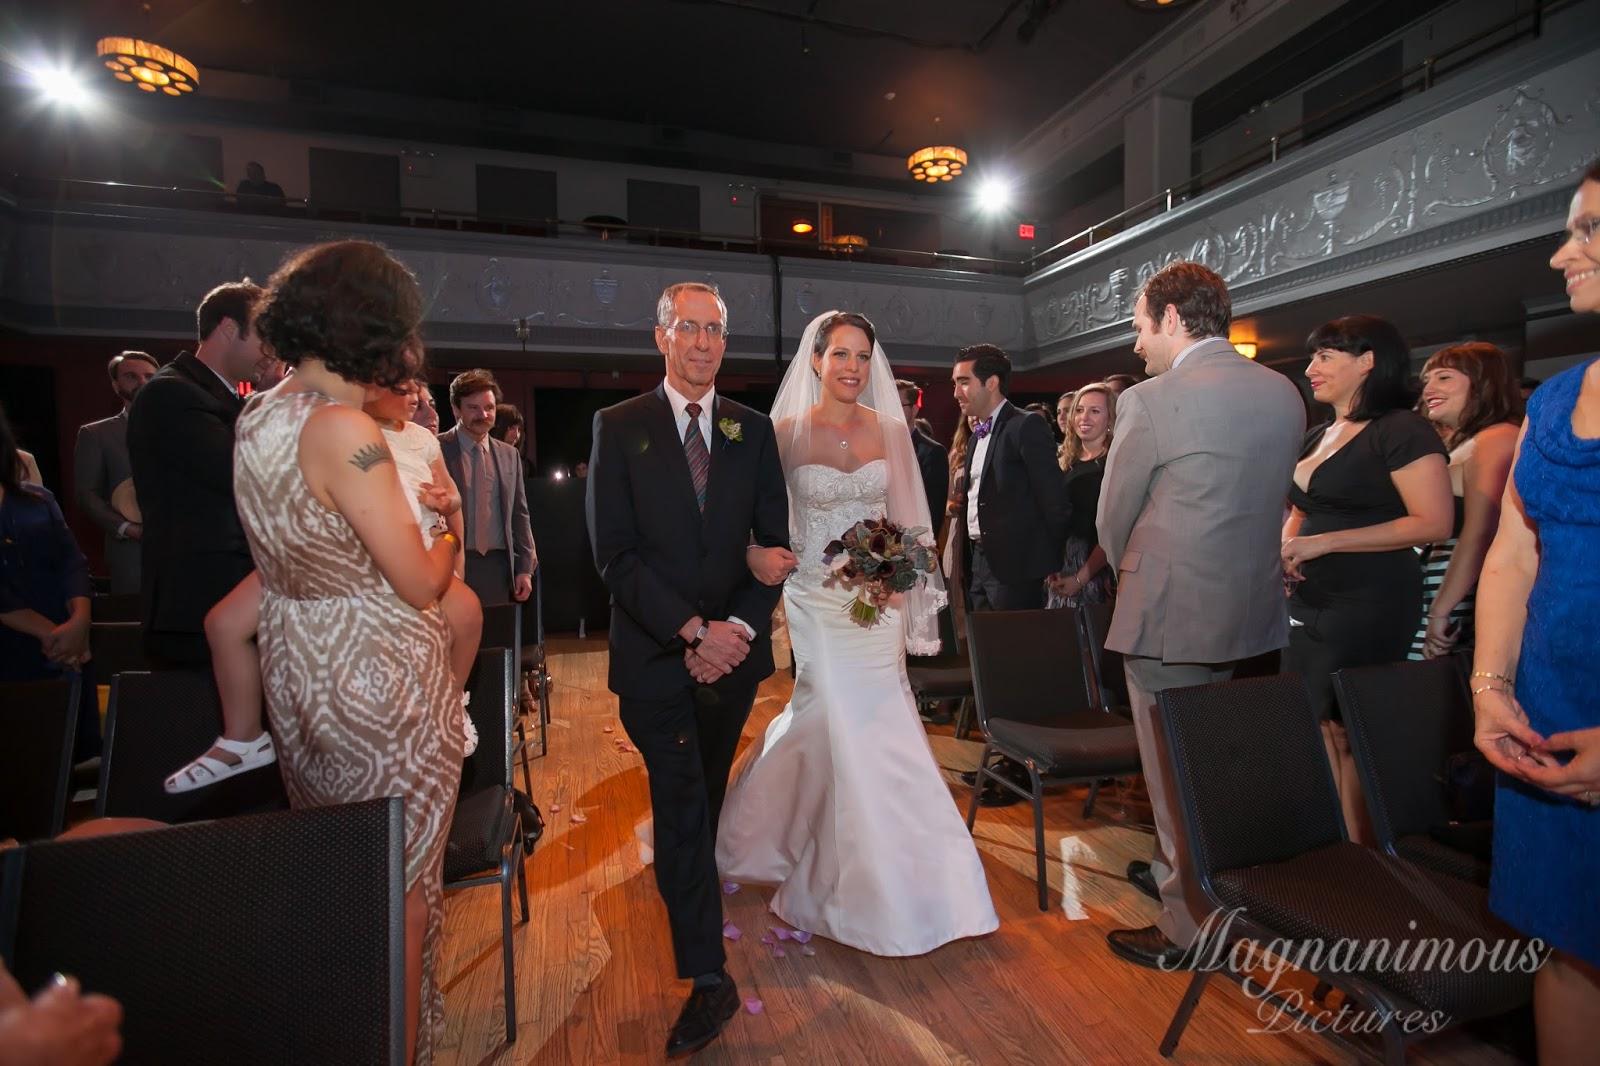 Roulette brooklyn wedding legal gambling sites usa